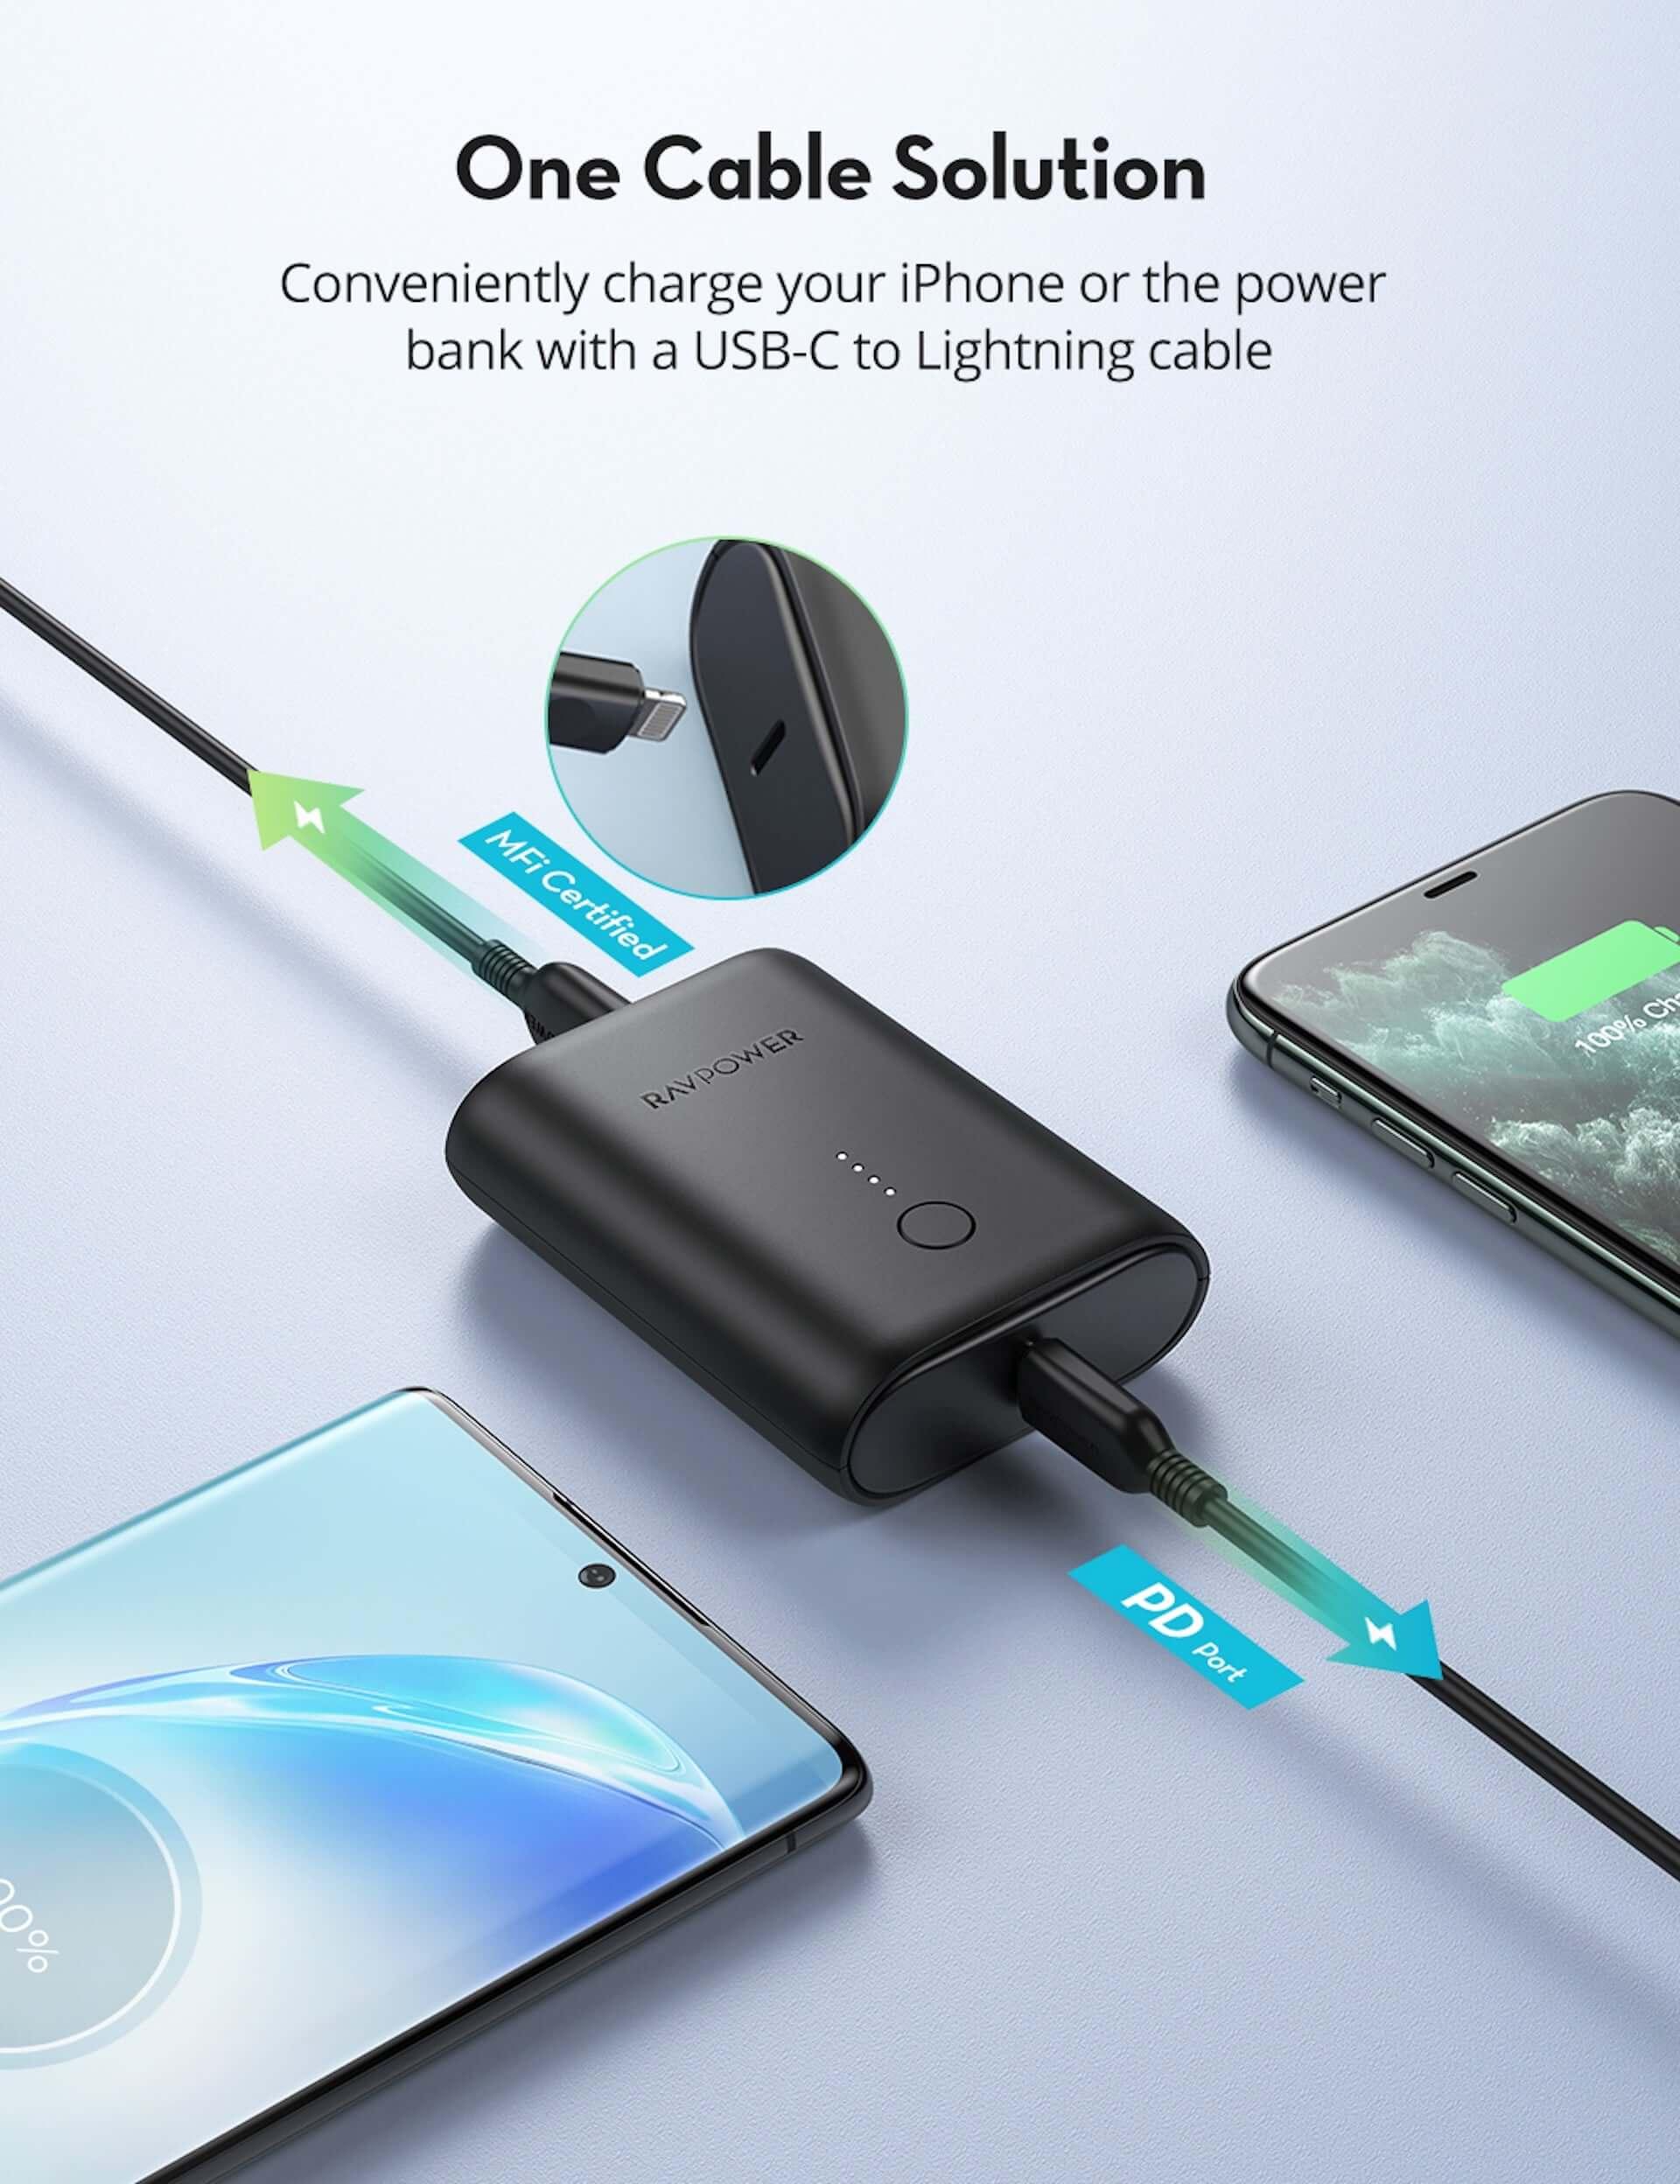 10000mAhの大容量モバイルバッテリーがRAVPowerから発売中!名刺入れやカードよりも小さいサイズ tech200727_ravpower_06-1920x2496